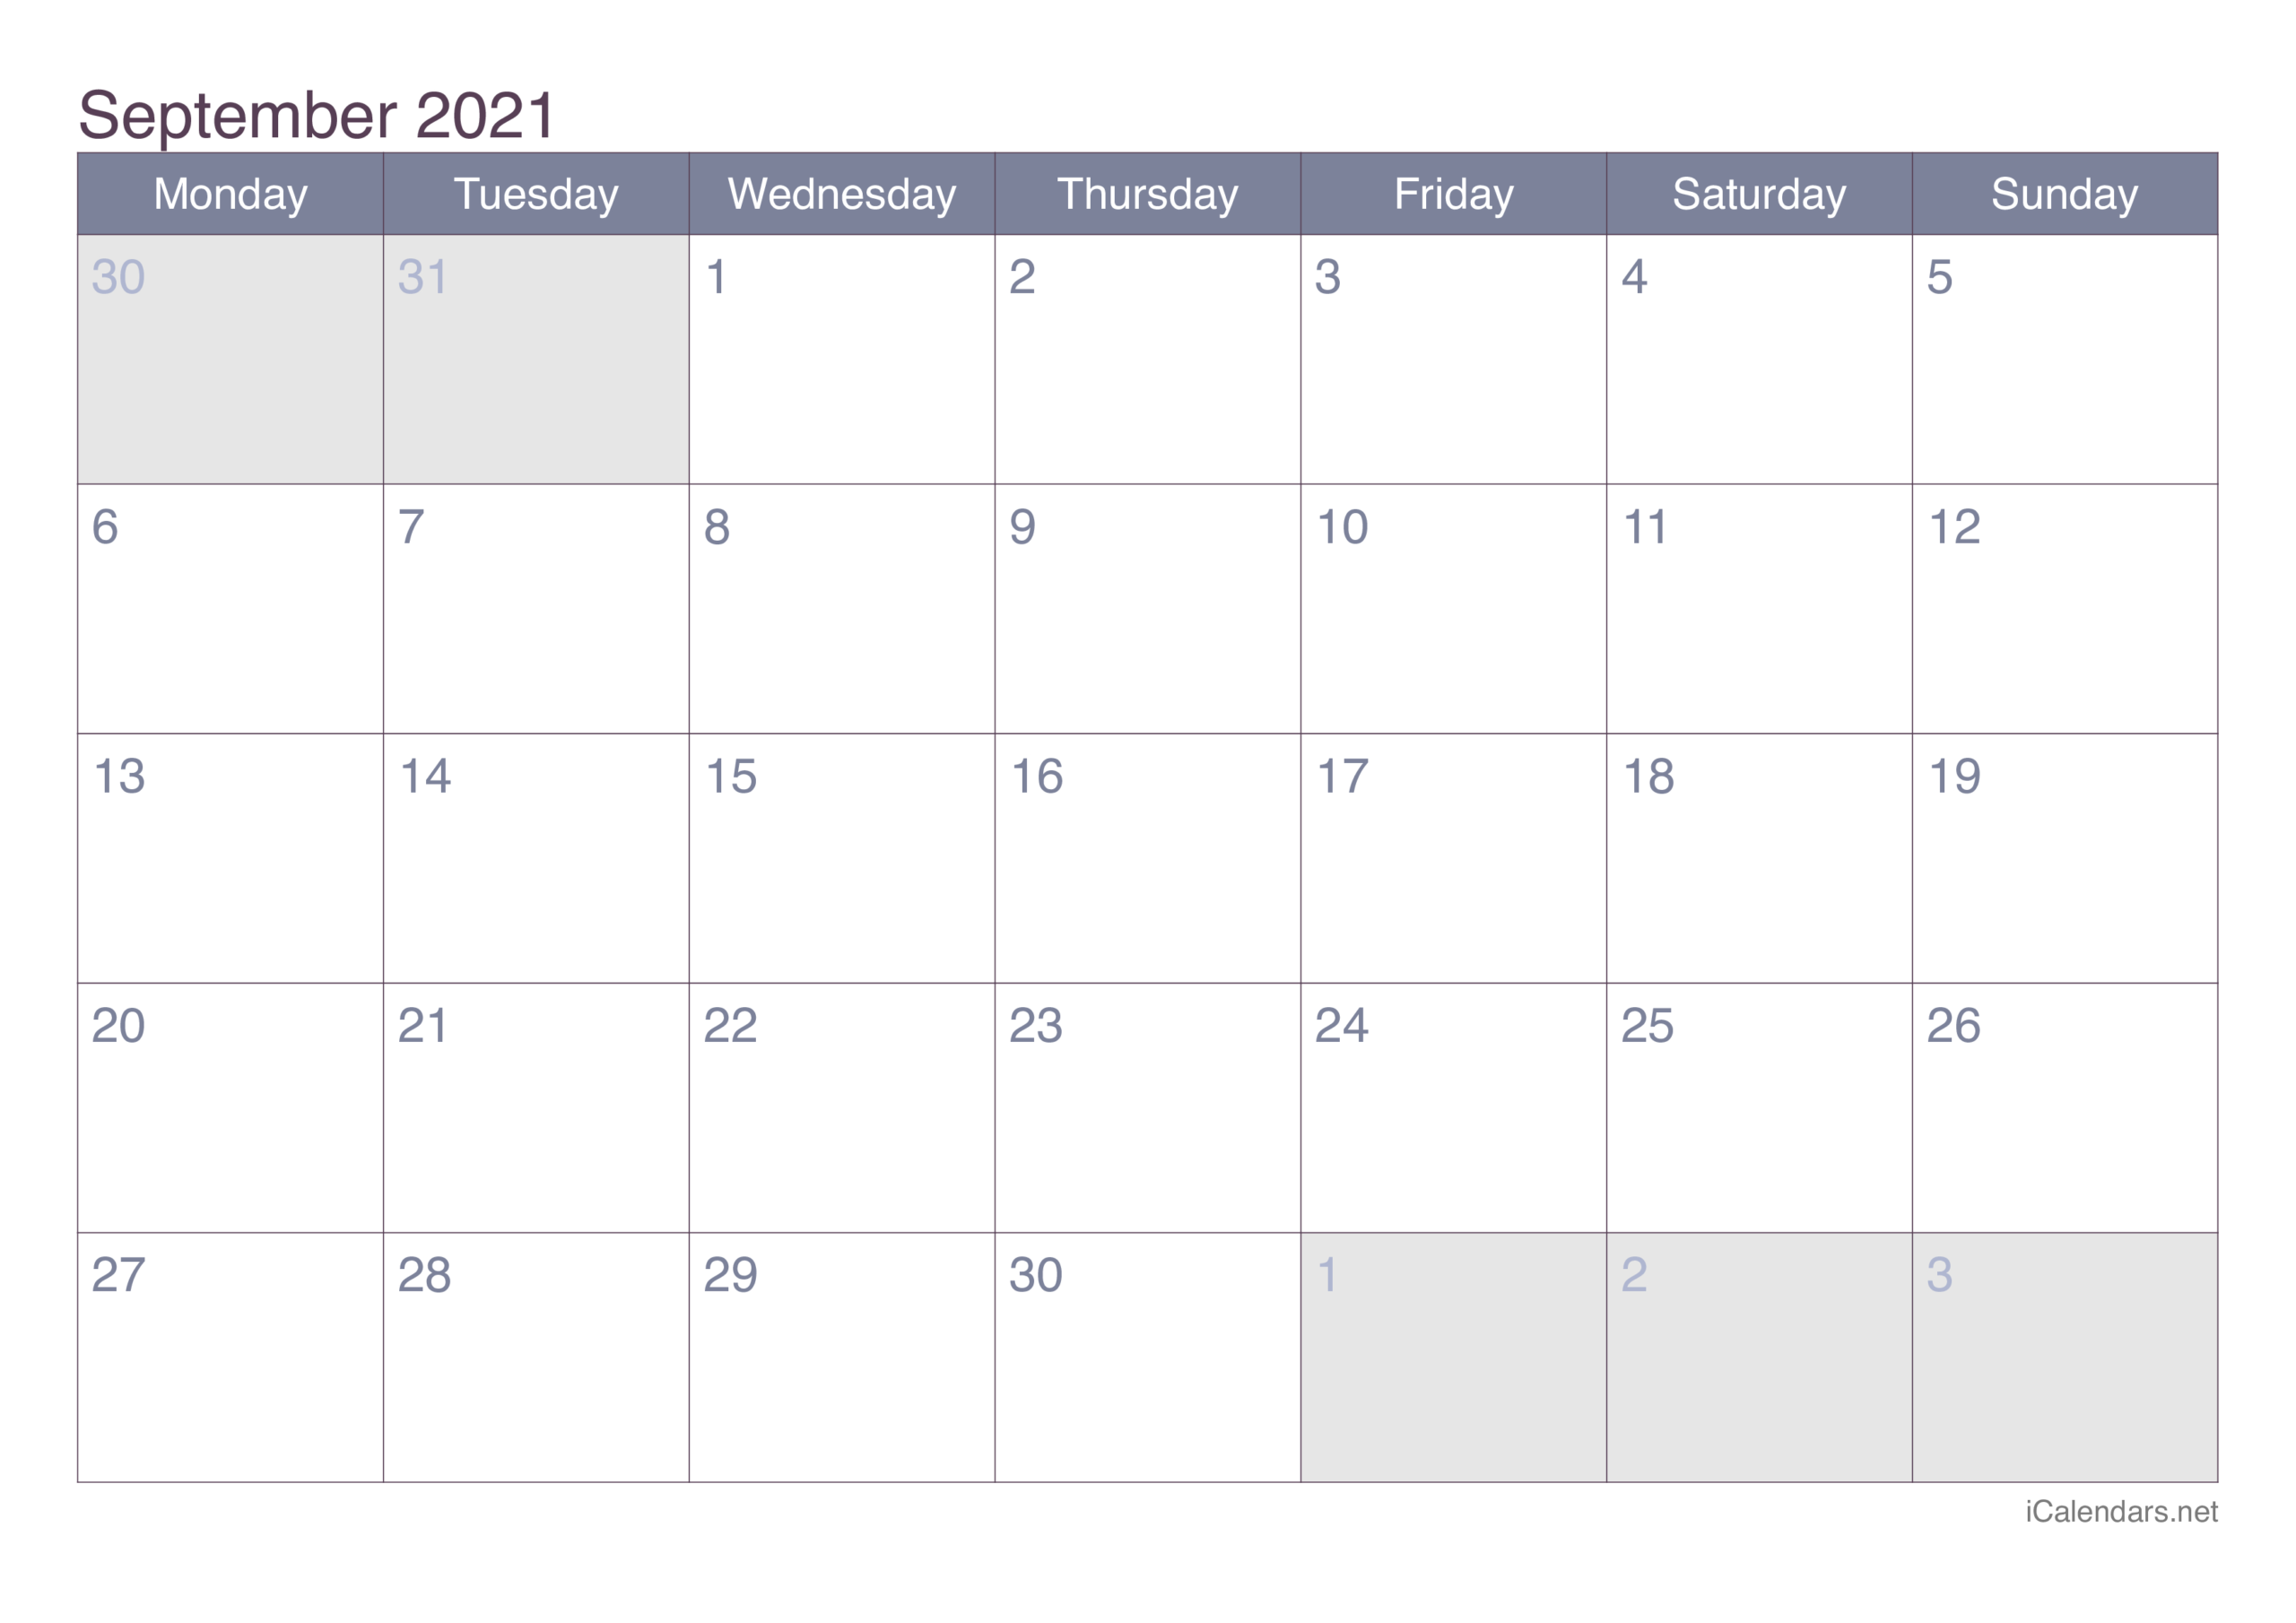 September 2021 Printable Calendar - Icalendars